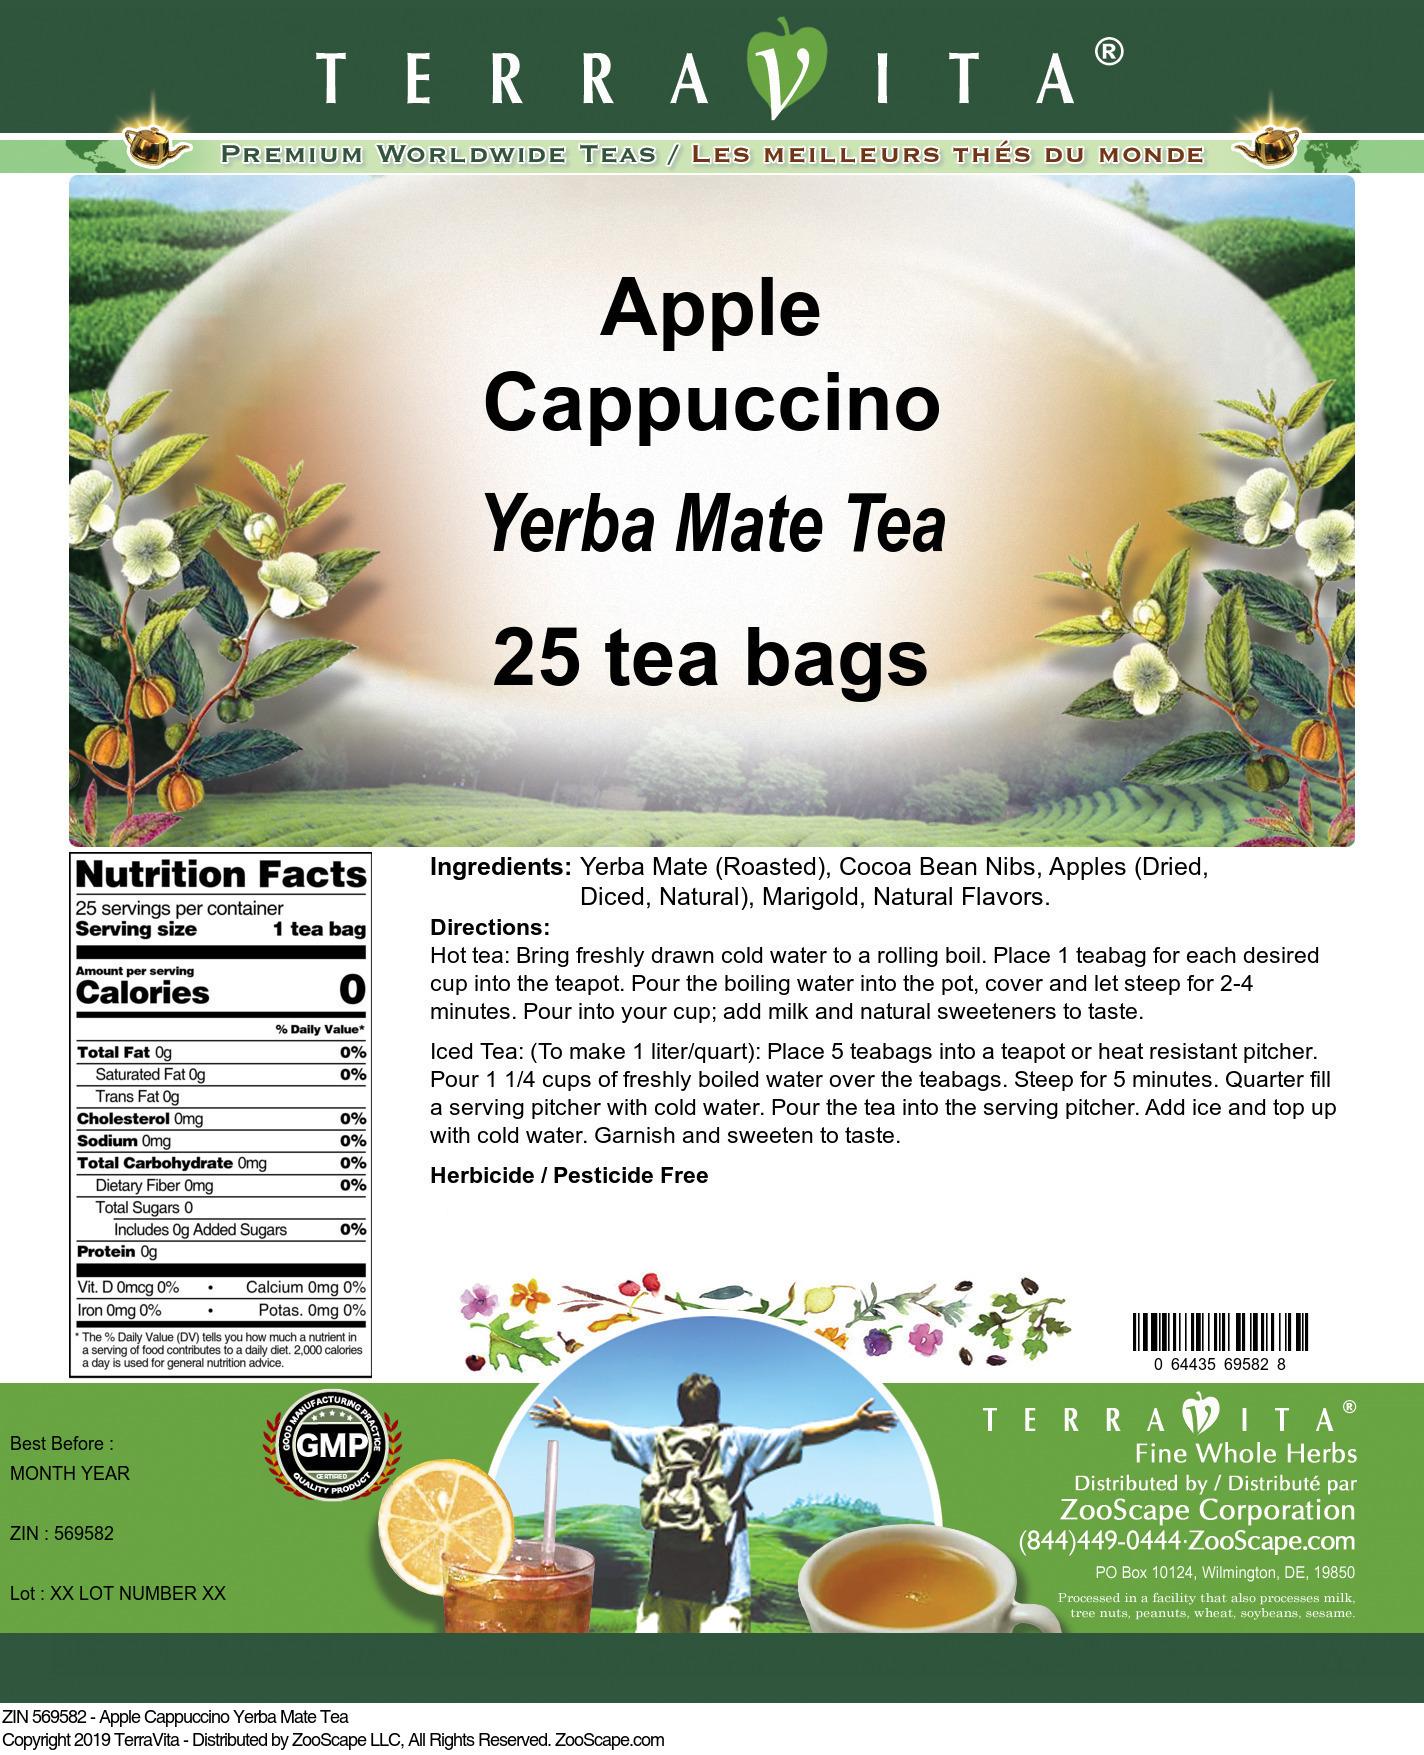 Apple Cappuccino Yerba Mate Tea